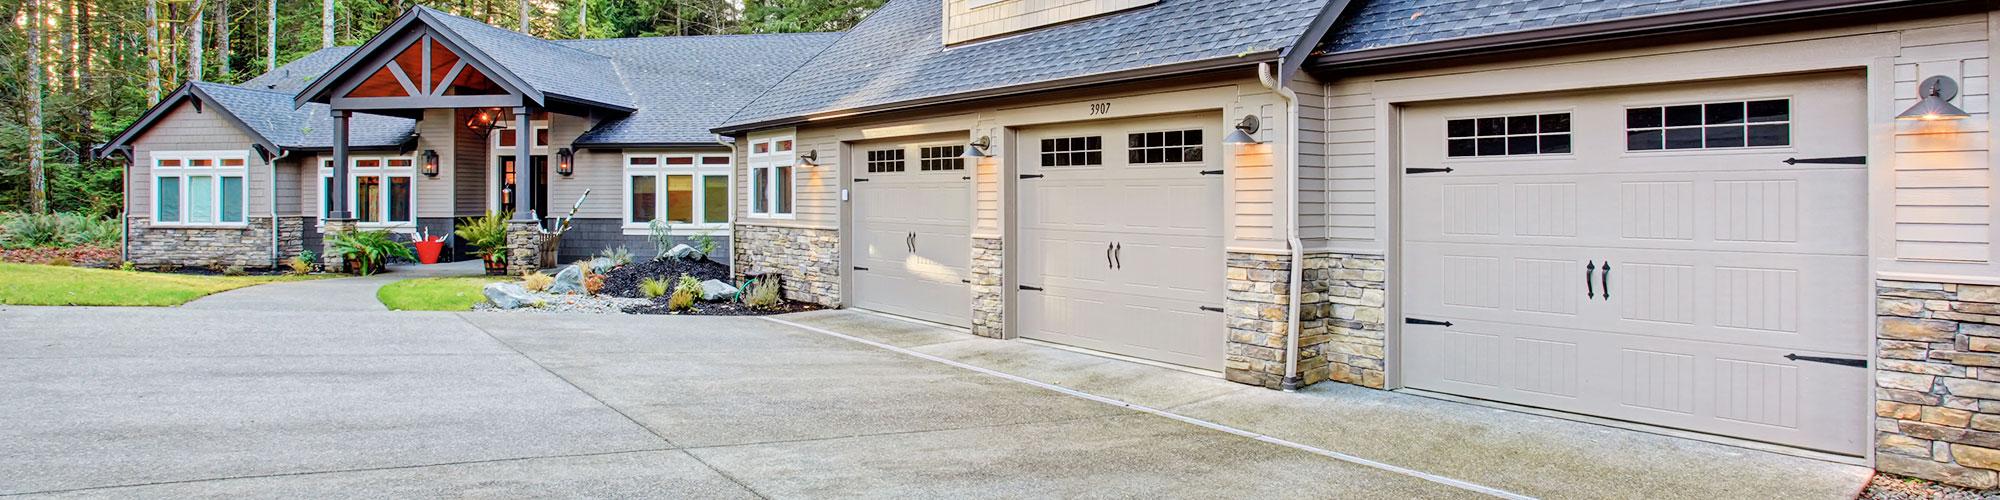 Garage Door Repair Calabasas CA | $19 Svc (818) 237-2813